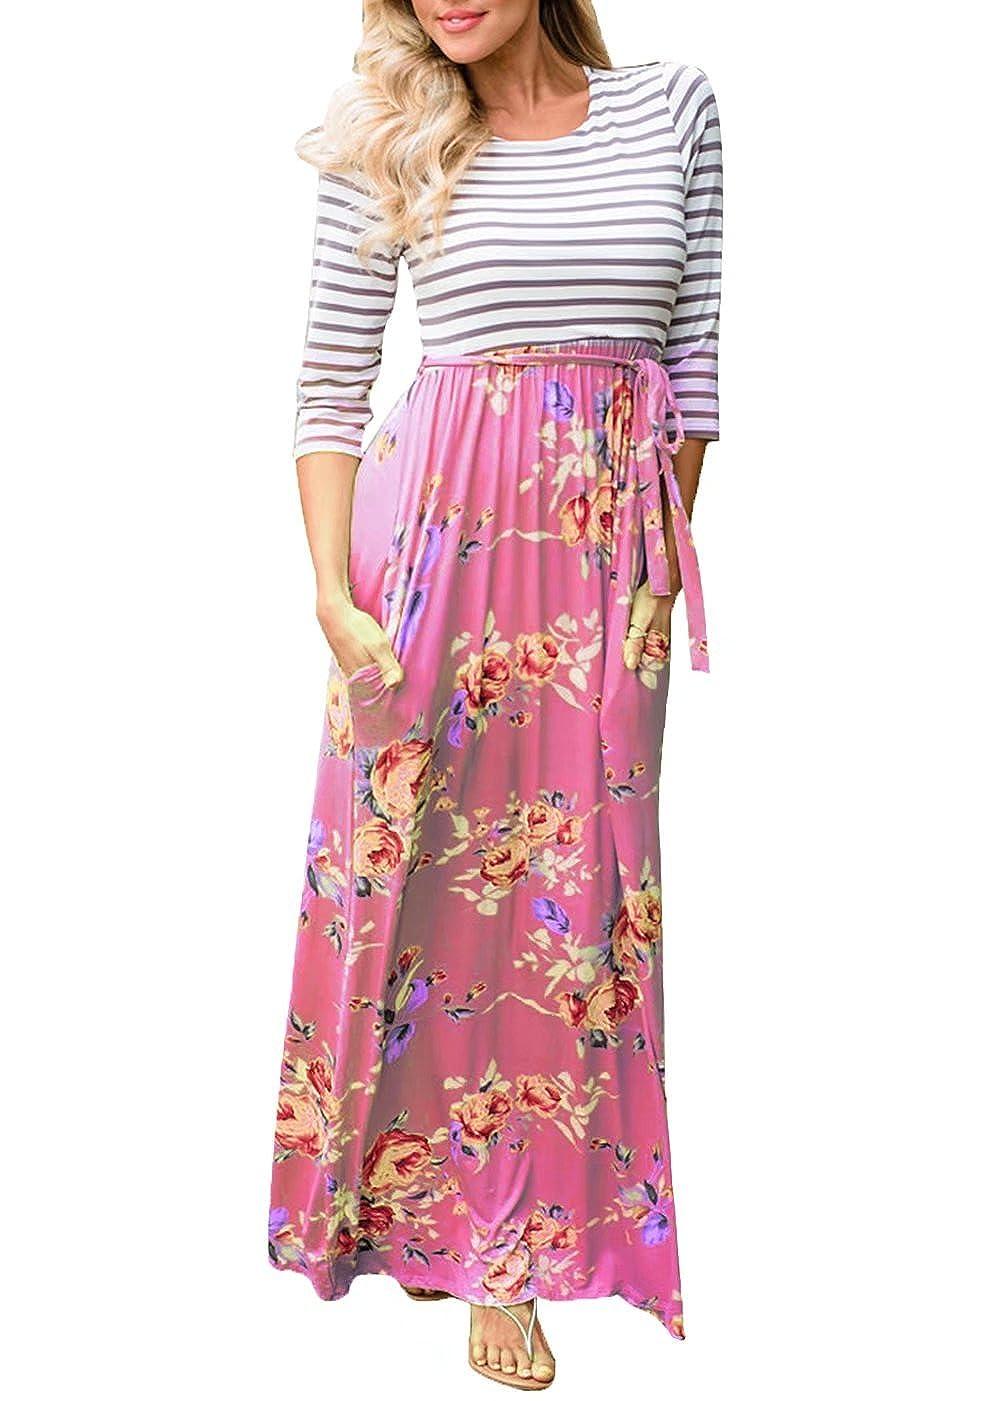 Pink FOUNDO Women's 3 4 Sleeve Striped Tops Pockets Floral Boho Long Maxi Dress